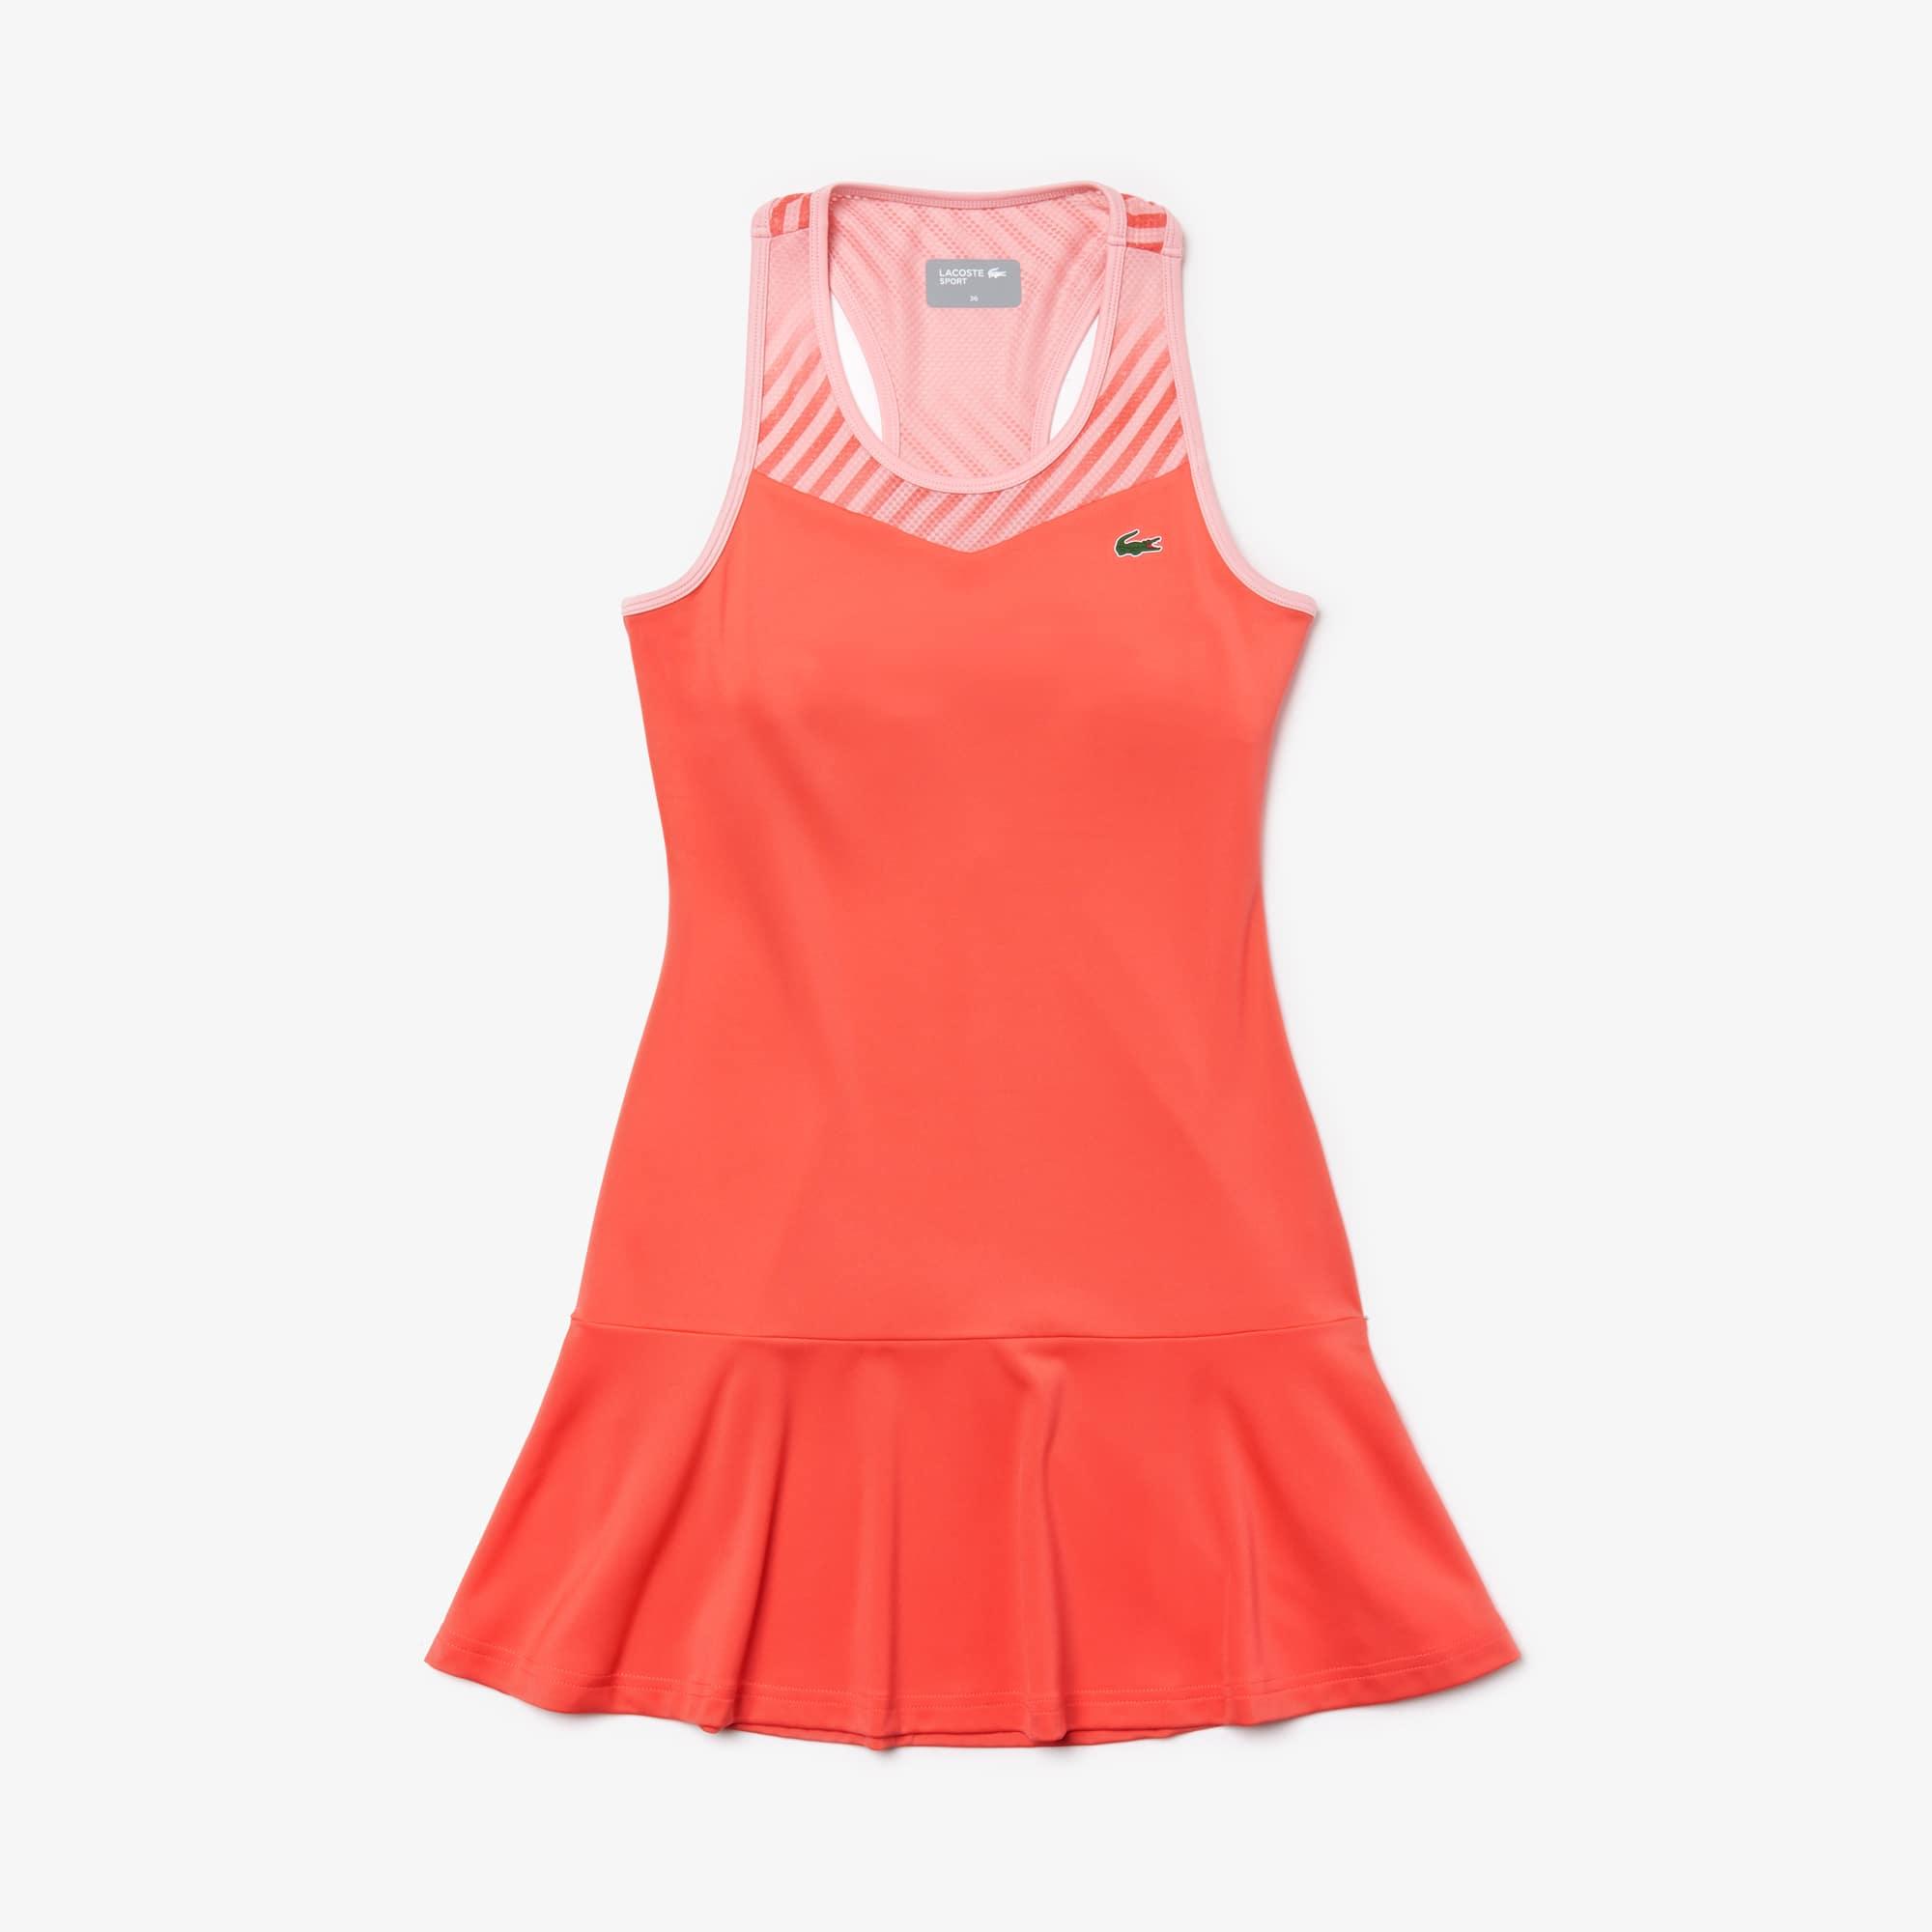 Robe dos nageur Tennis Lacoste SPORT ultra-dry imprimée